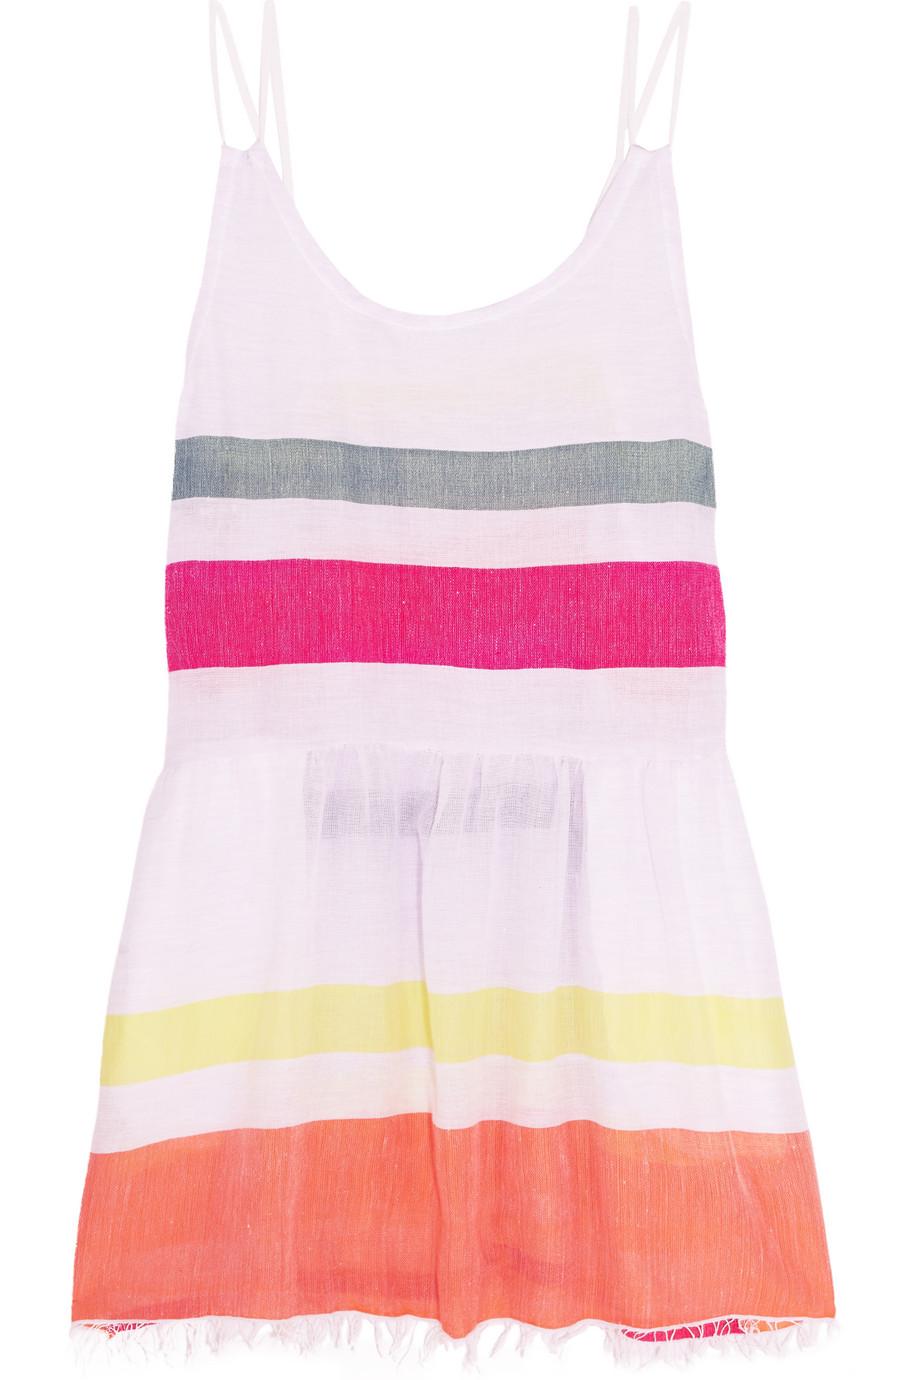 Lemlem Hali Striped Cotton-Blend Gauze Mini Dress, Lilac, Women's - Striped